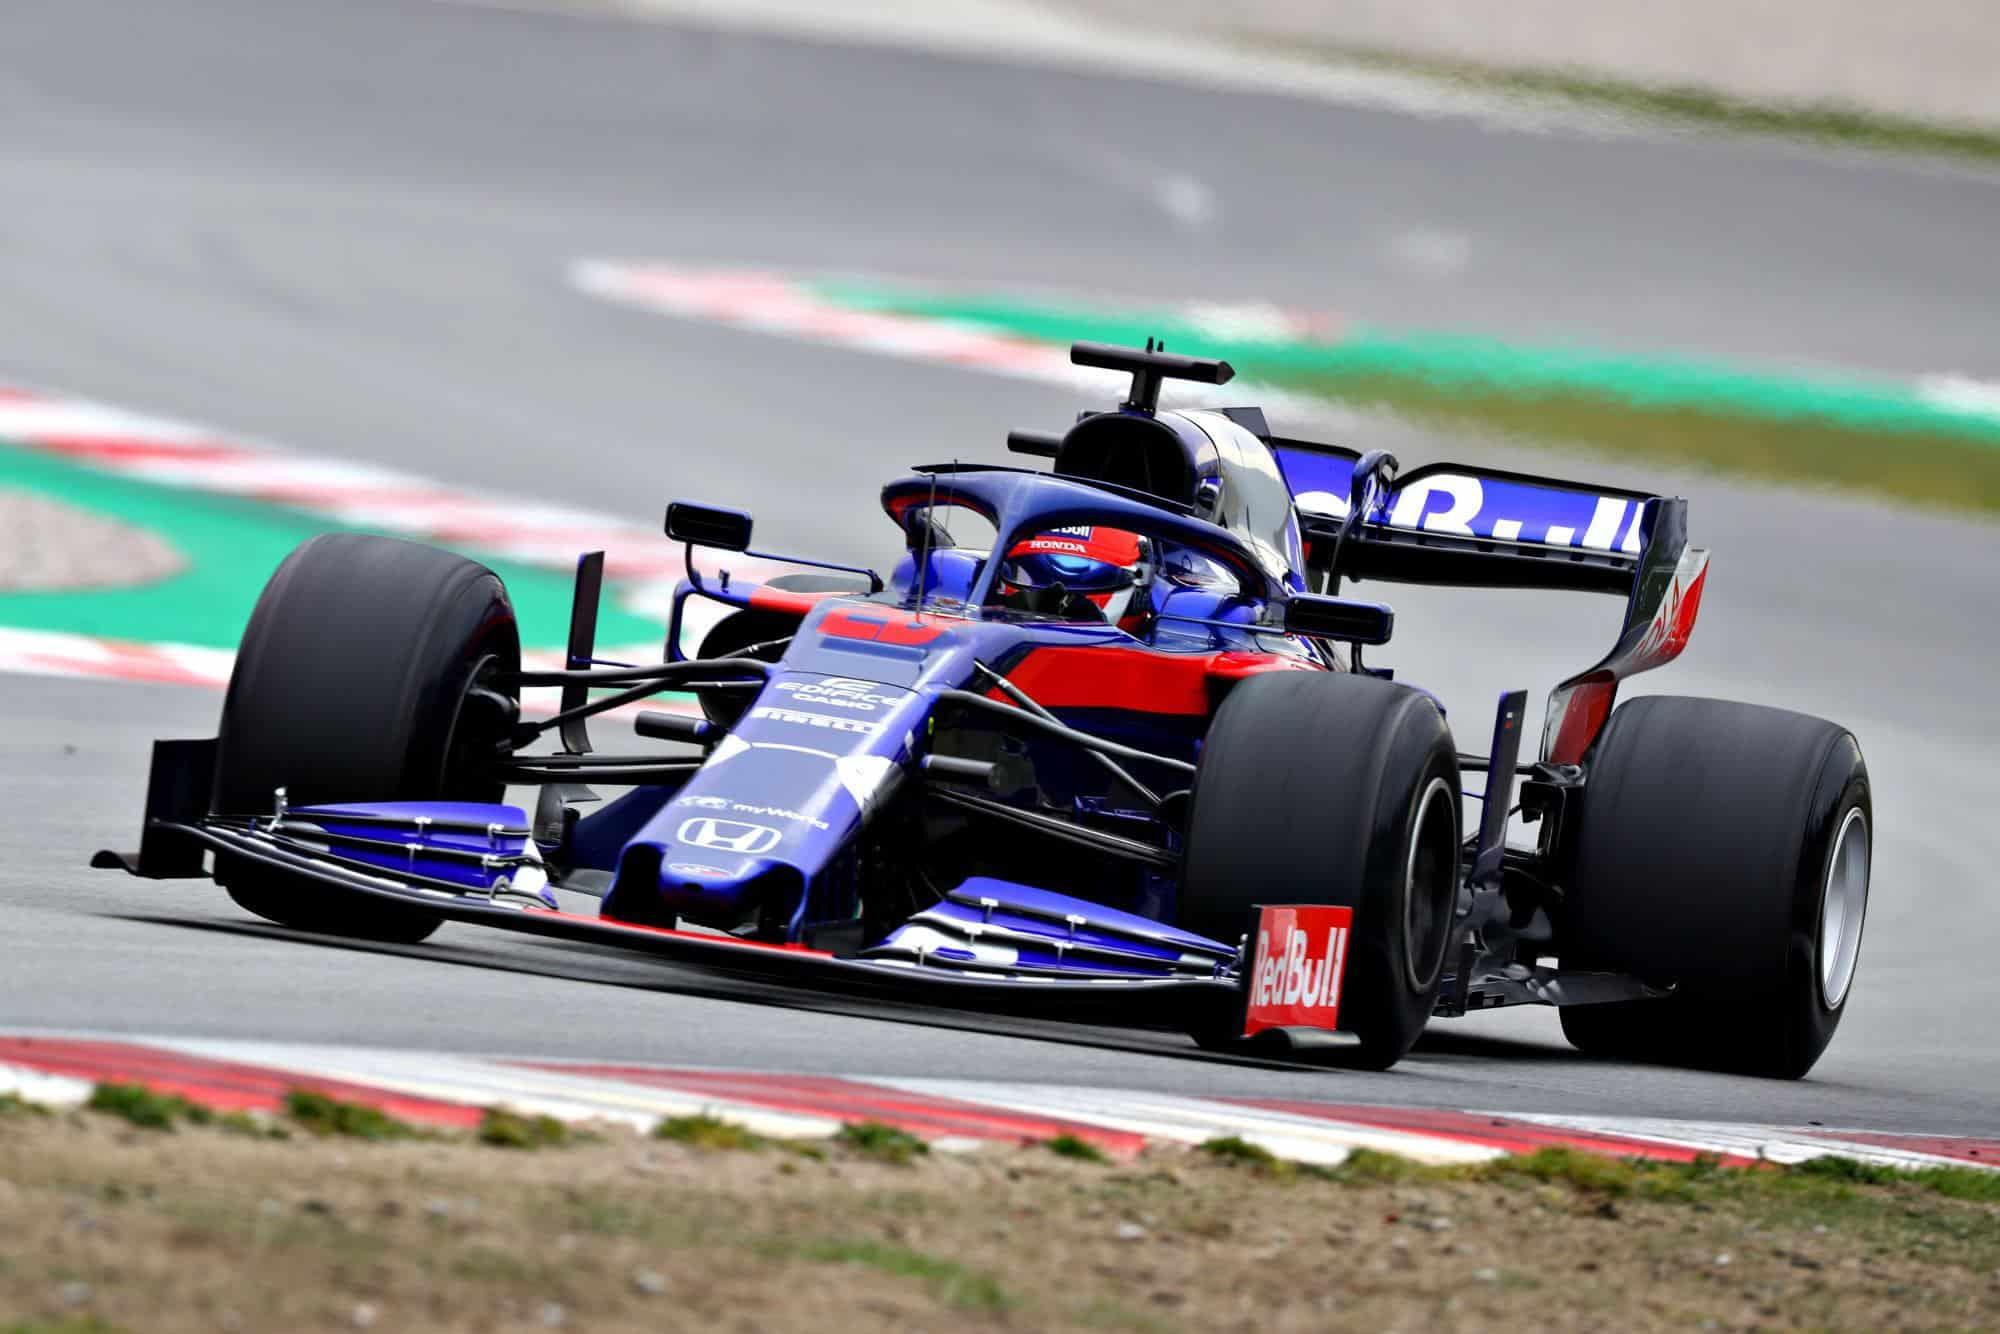 Daniil Kvyat Toro Rosso STR15 Honda Barcelona Test 1 Day 3 Photo Red Bull